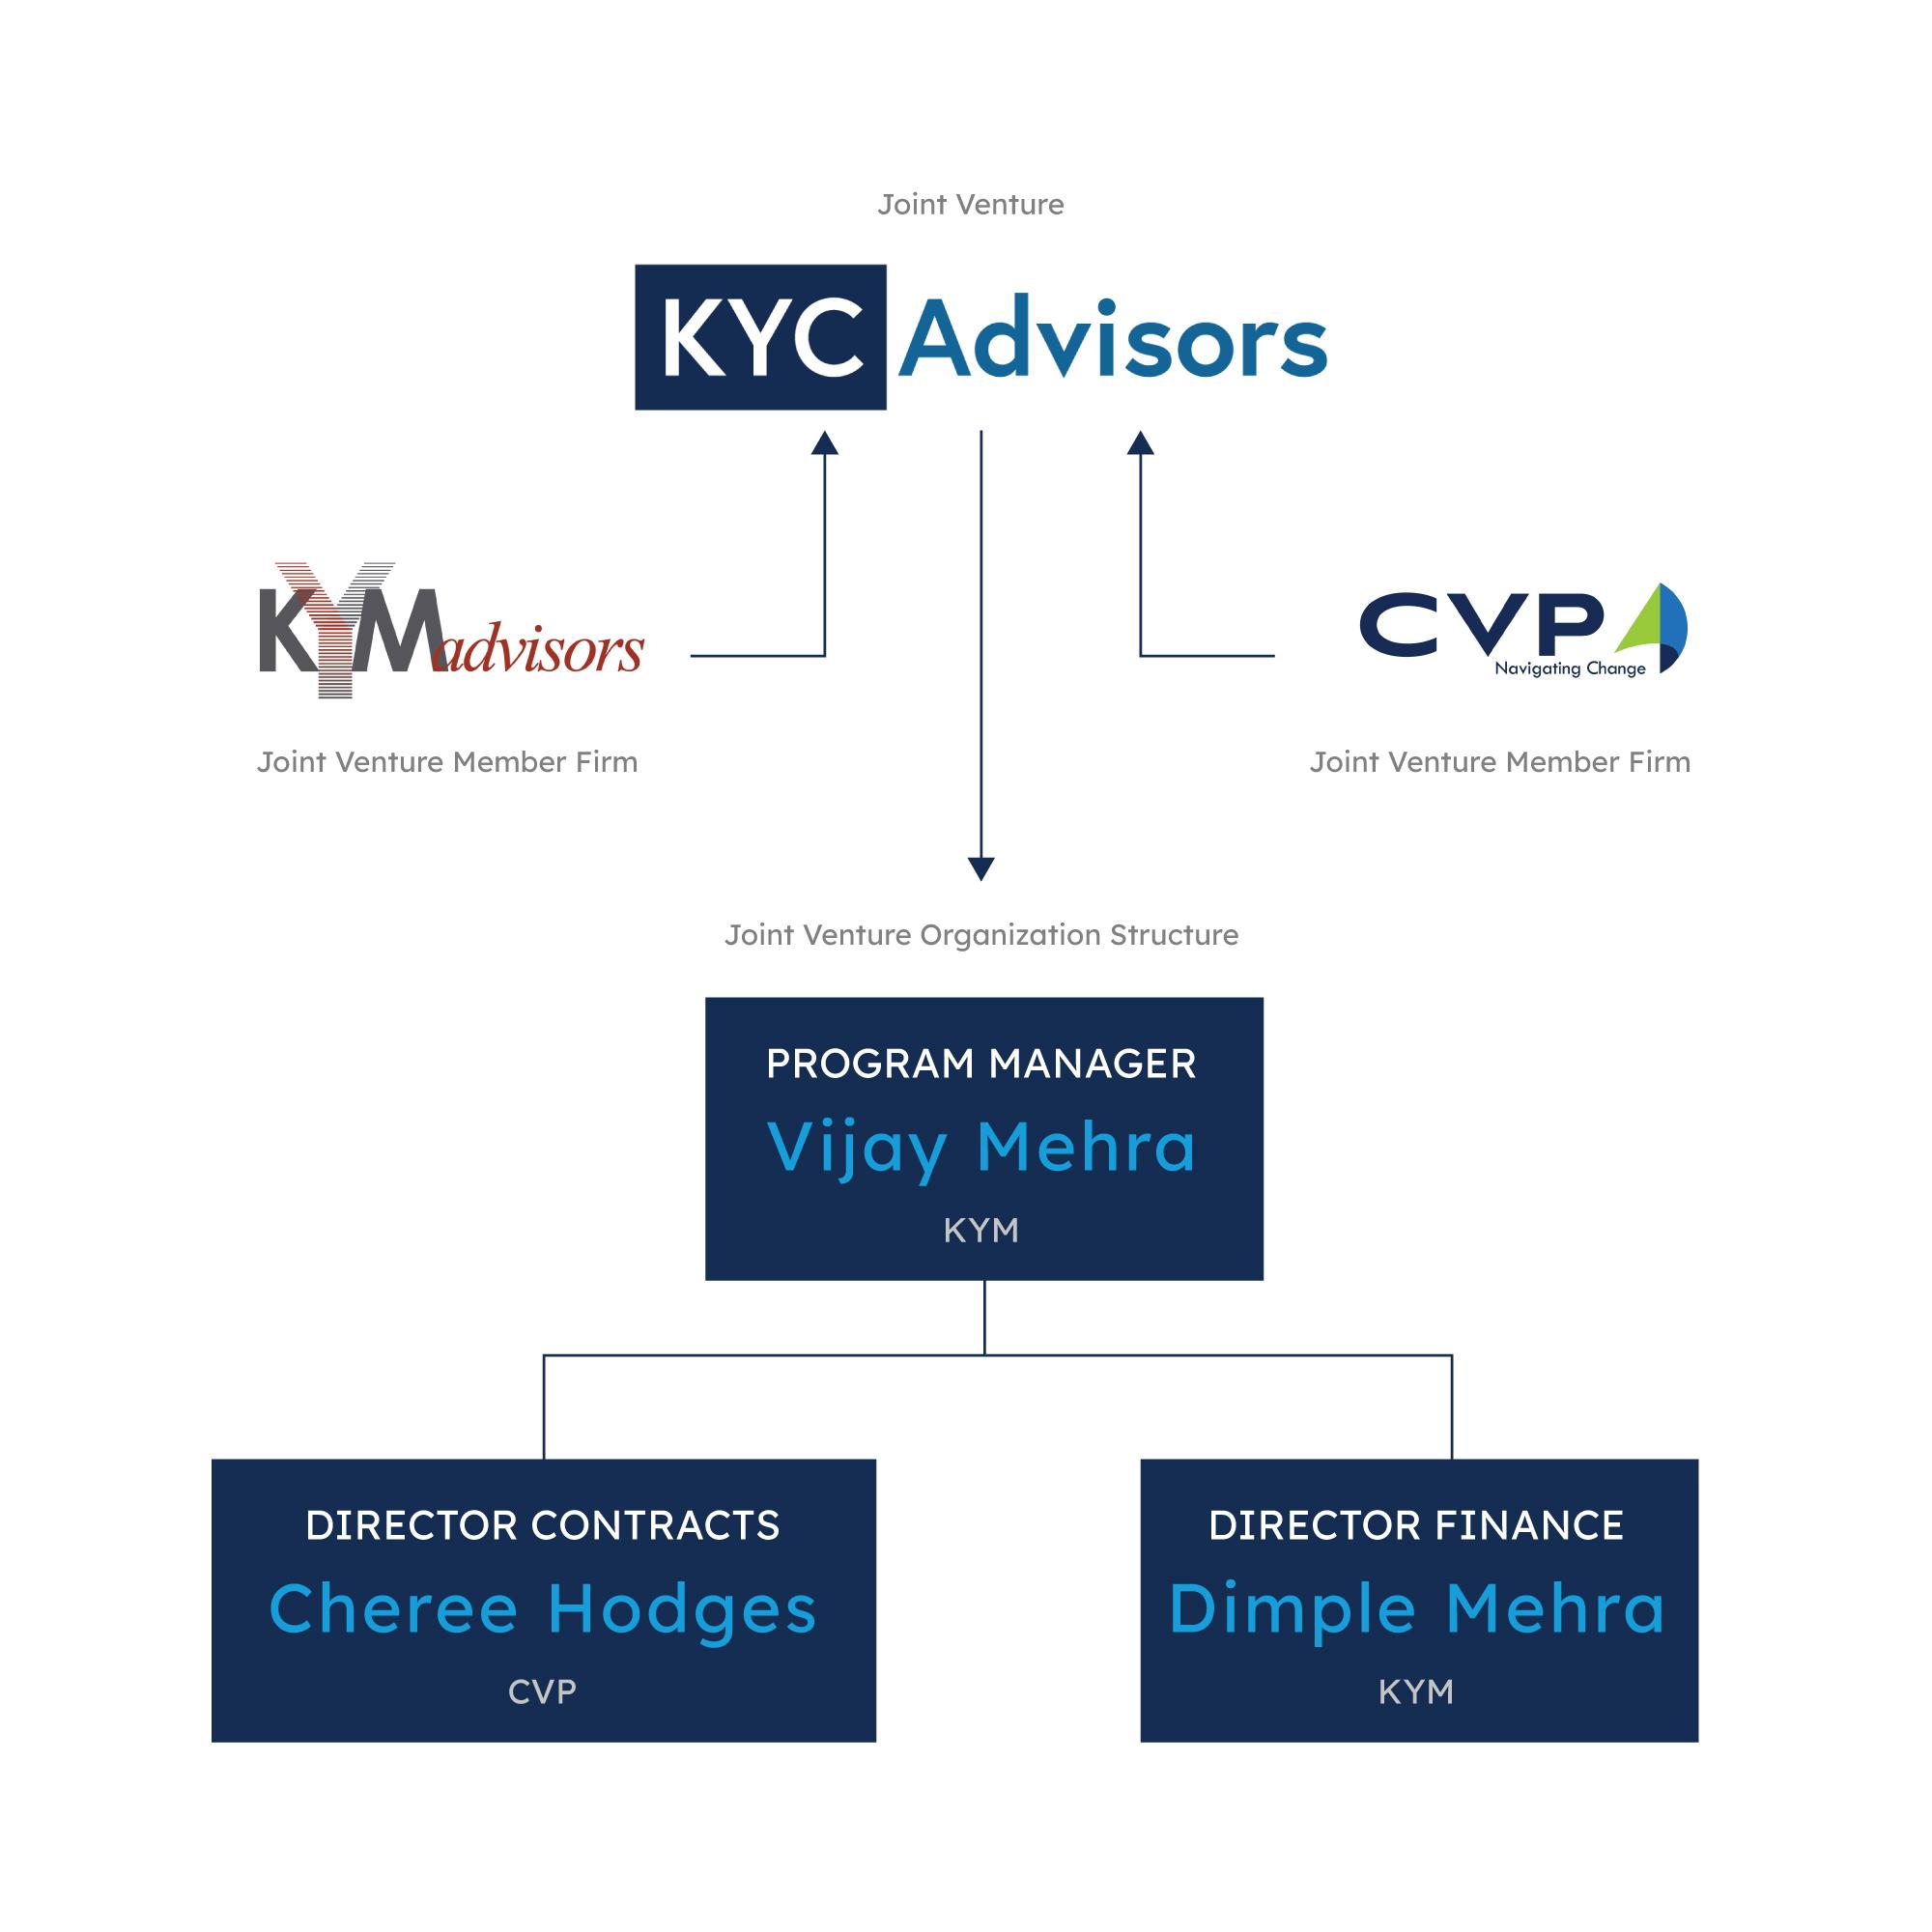 KYC Leadership